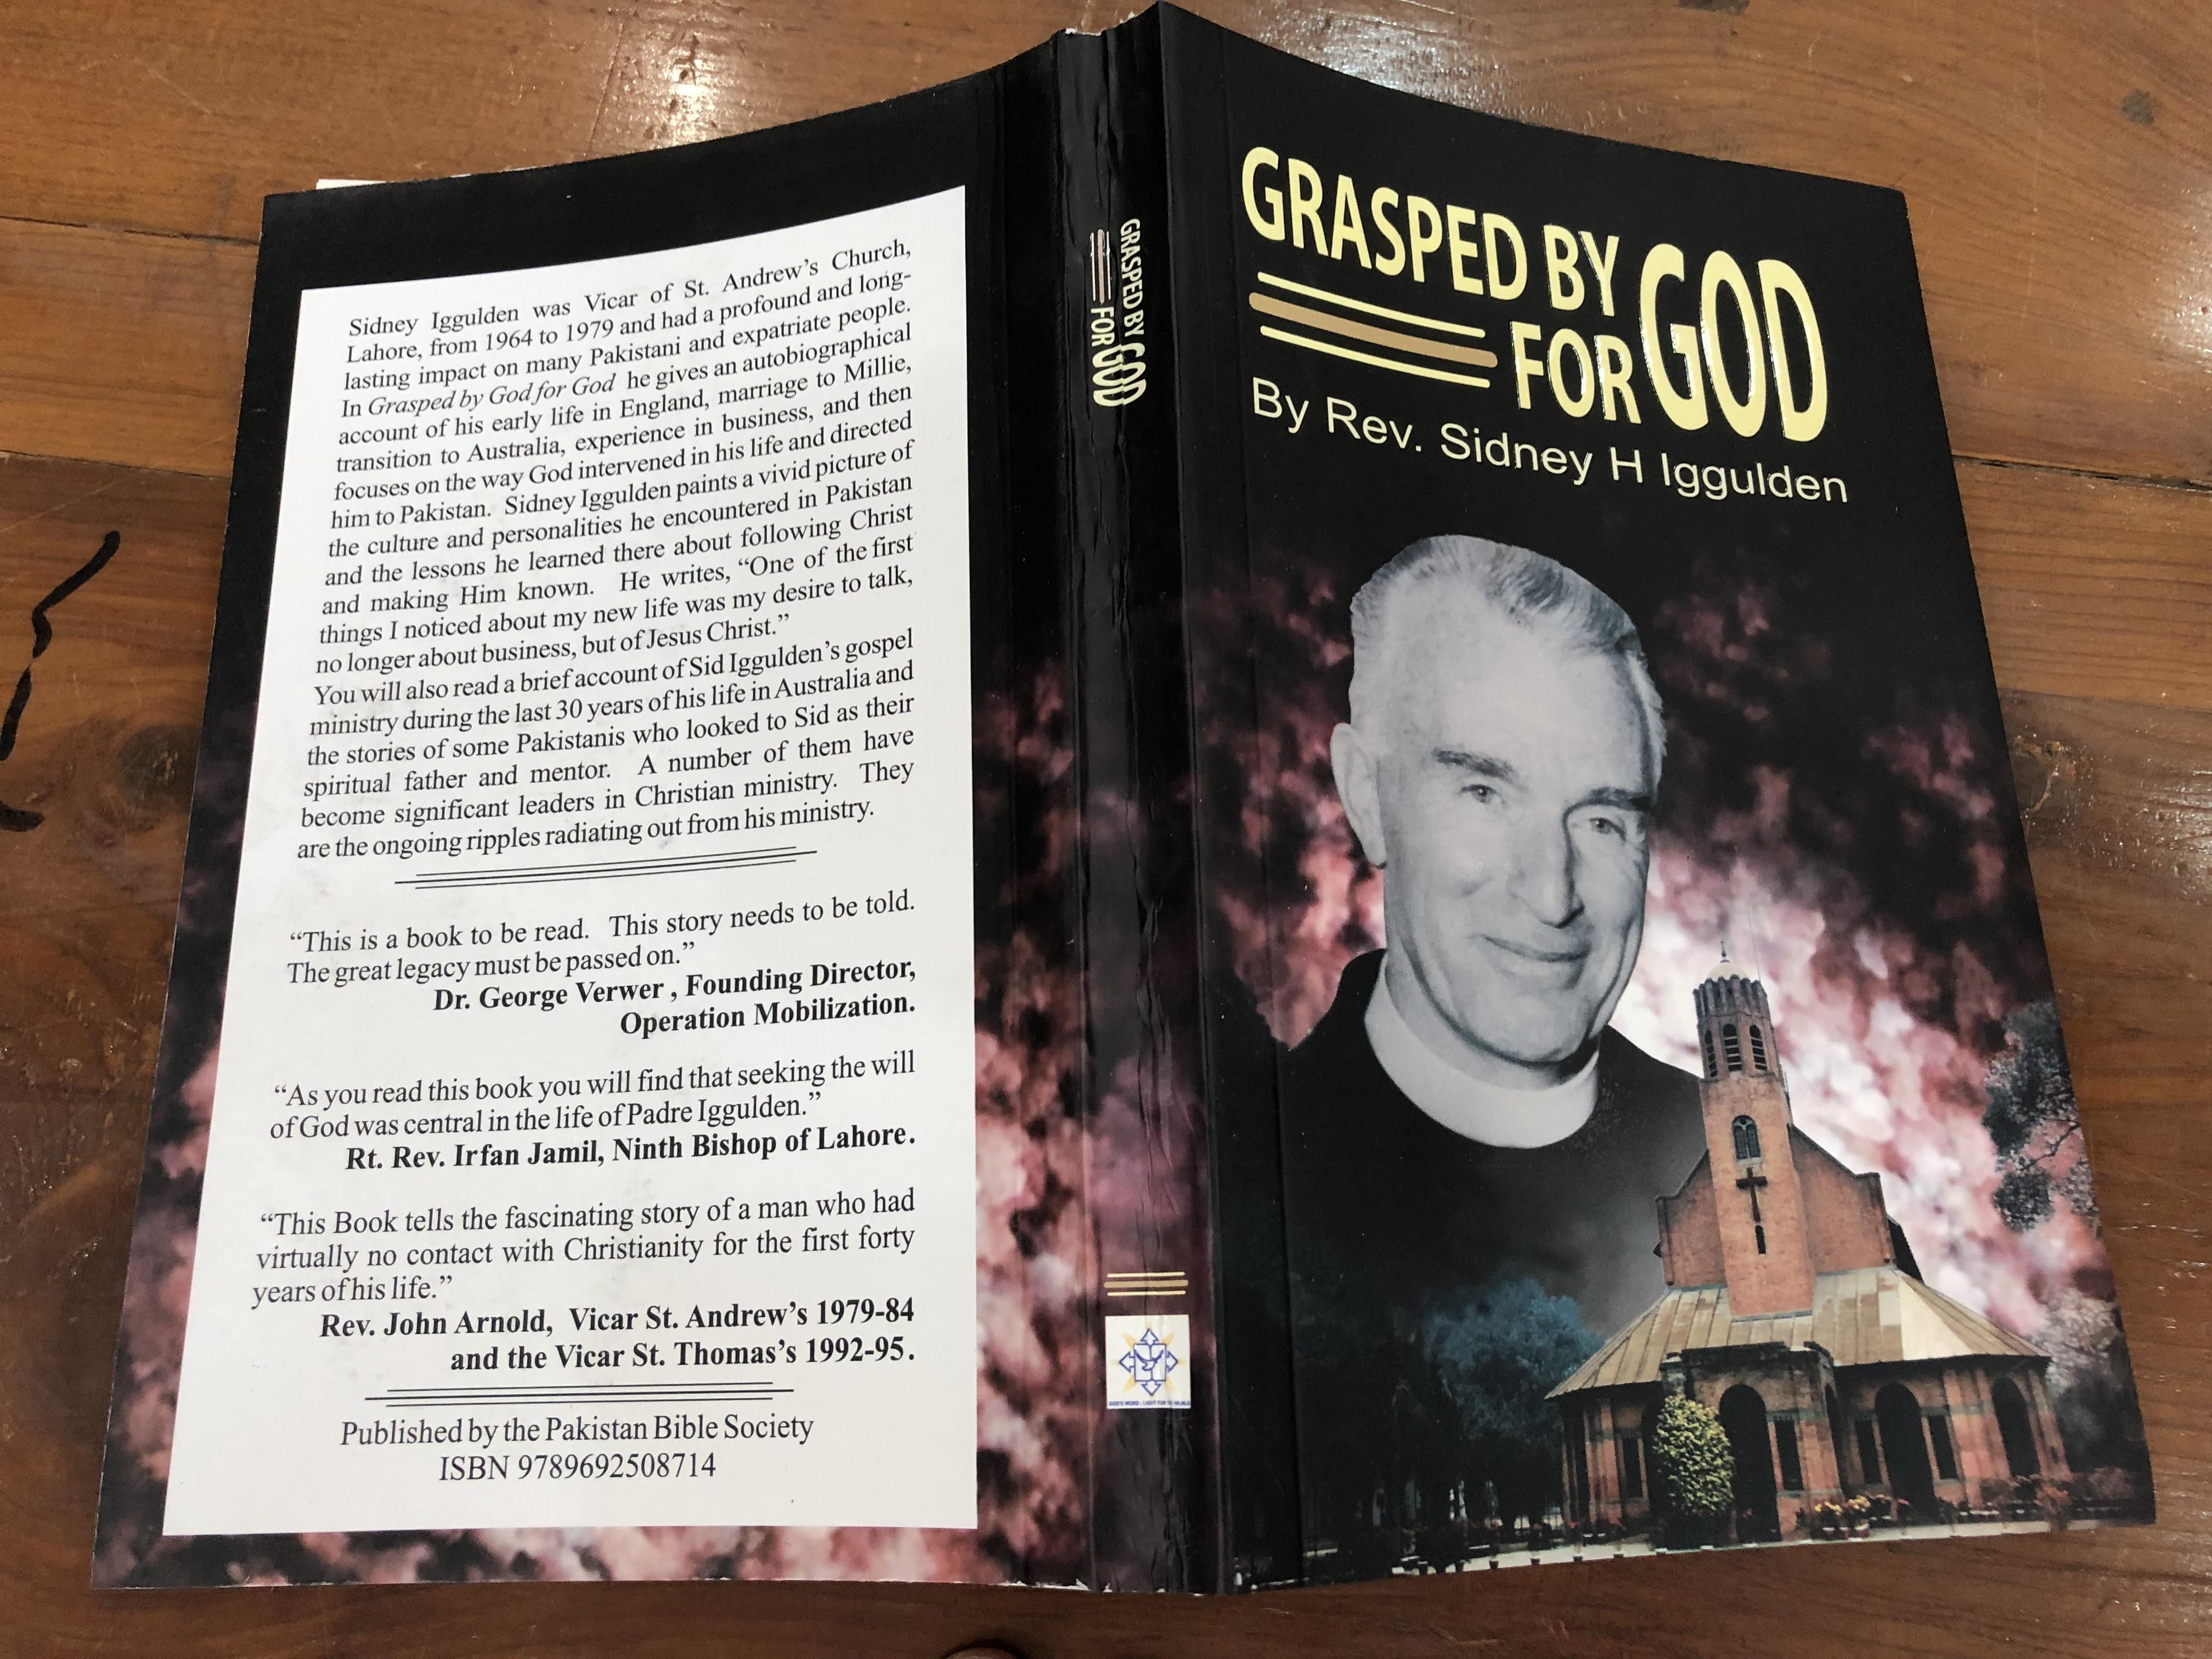 grasped-by-god-for-god-memoirs-of-rev.-sidney-h.-iggulden-pakistan-bible-society-2015-4-.jpg